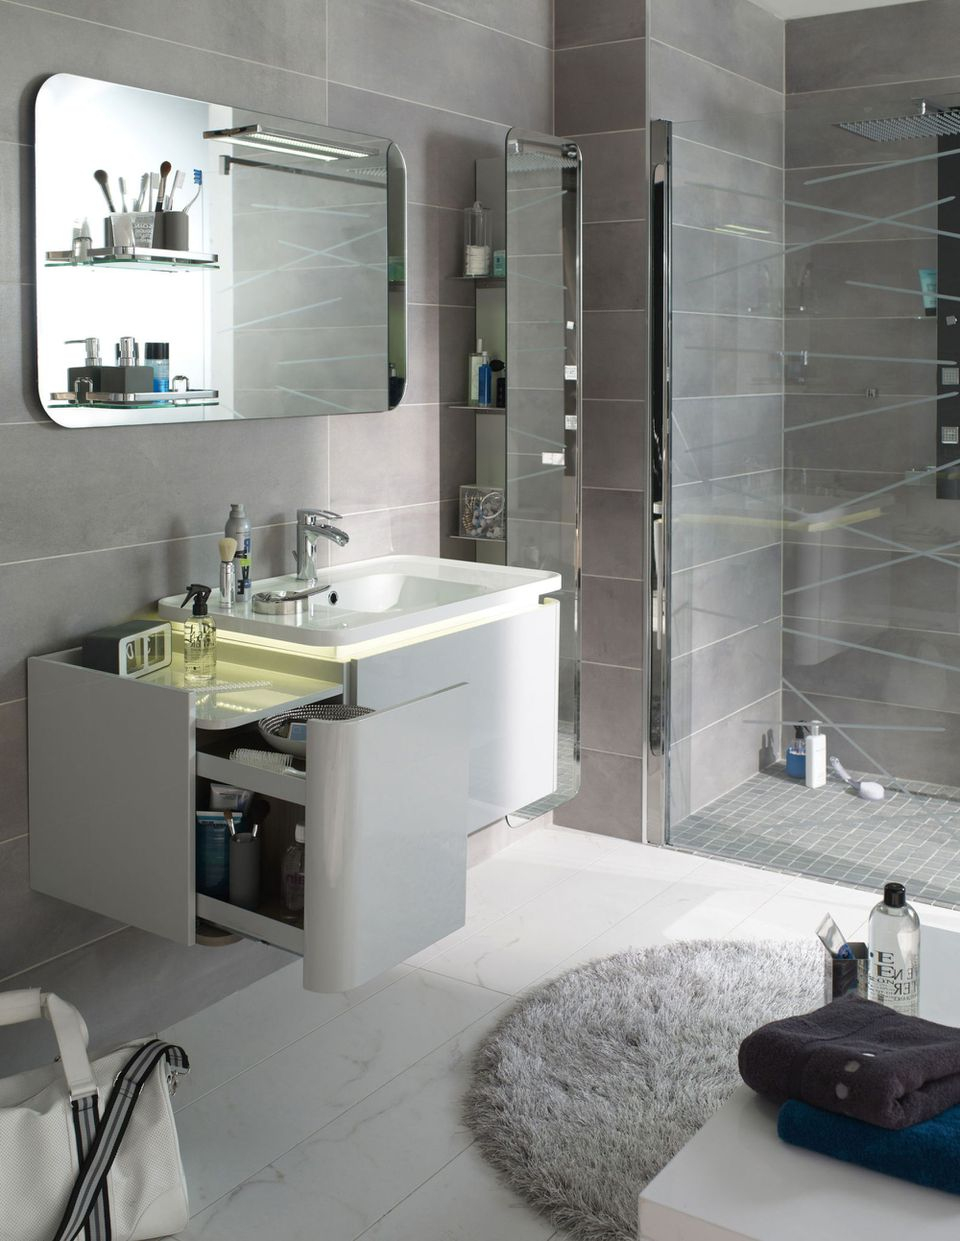 10 Astuces Pour Aménager Une Petite Salle De Bains destiné Créer Sa Salle De Bain